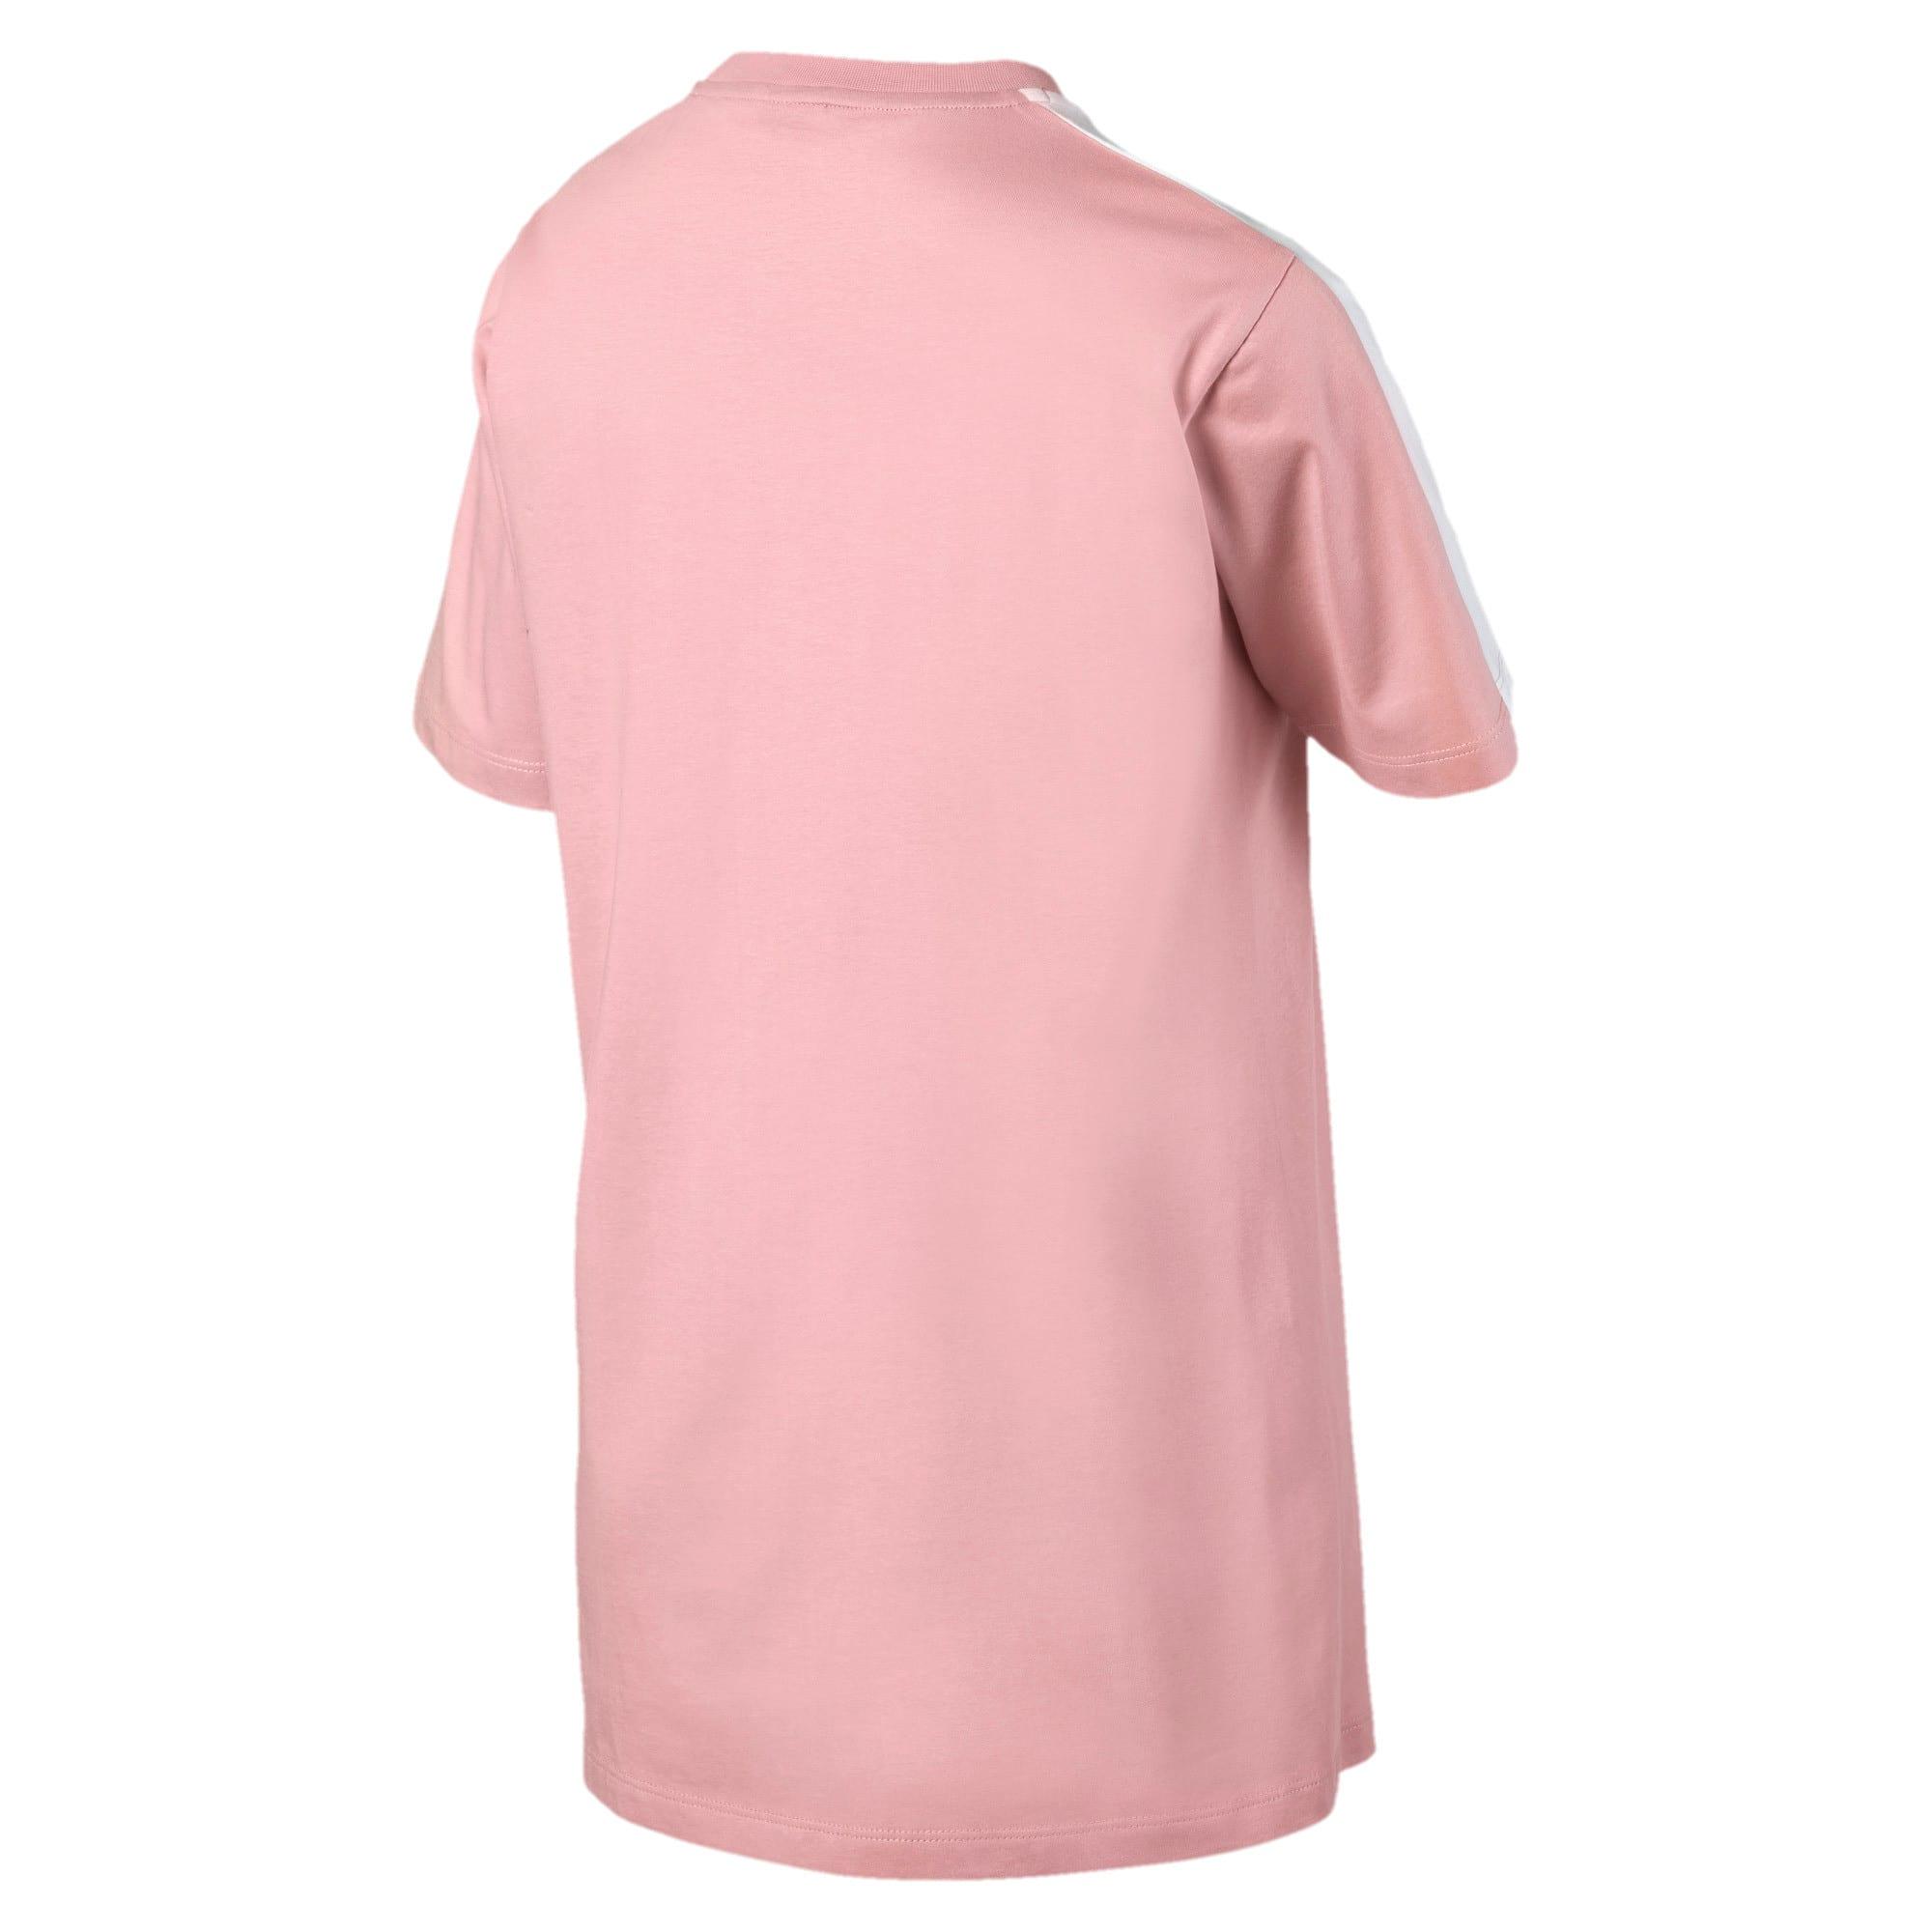 Miniatura 5 de Camiseta Classics T7 para mujer, Bridal Rose, mediano